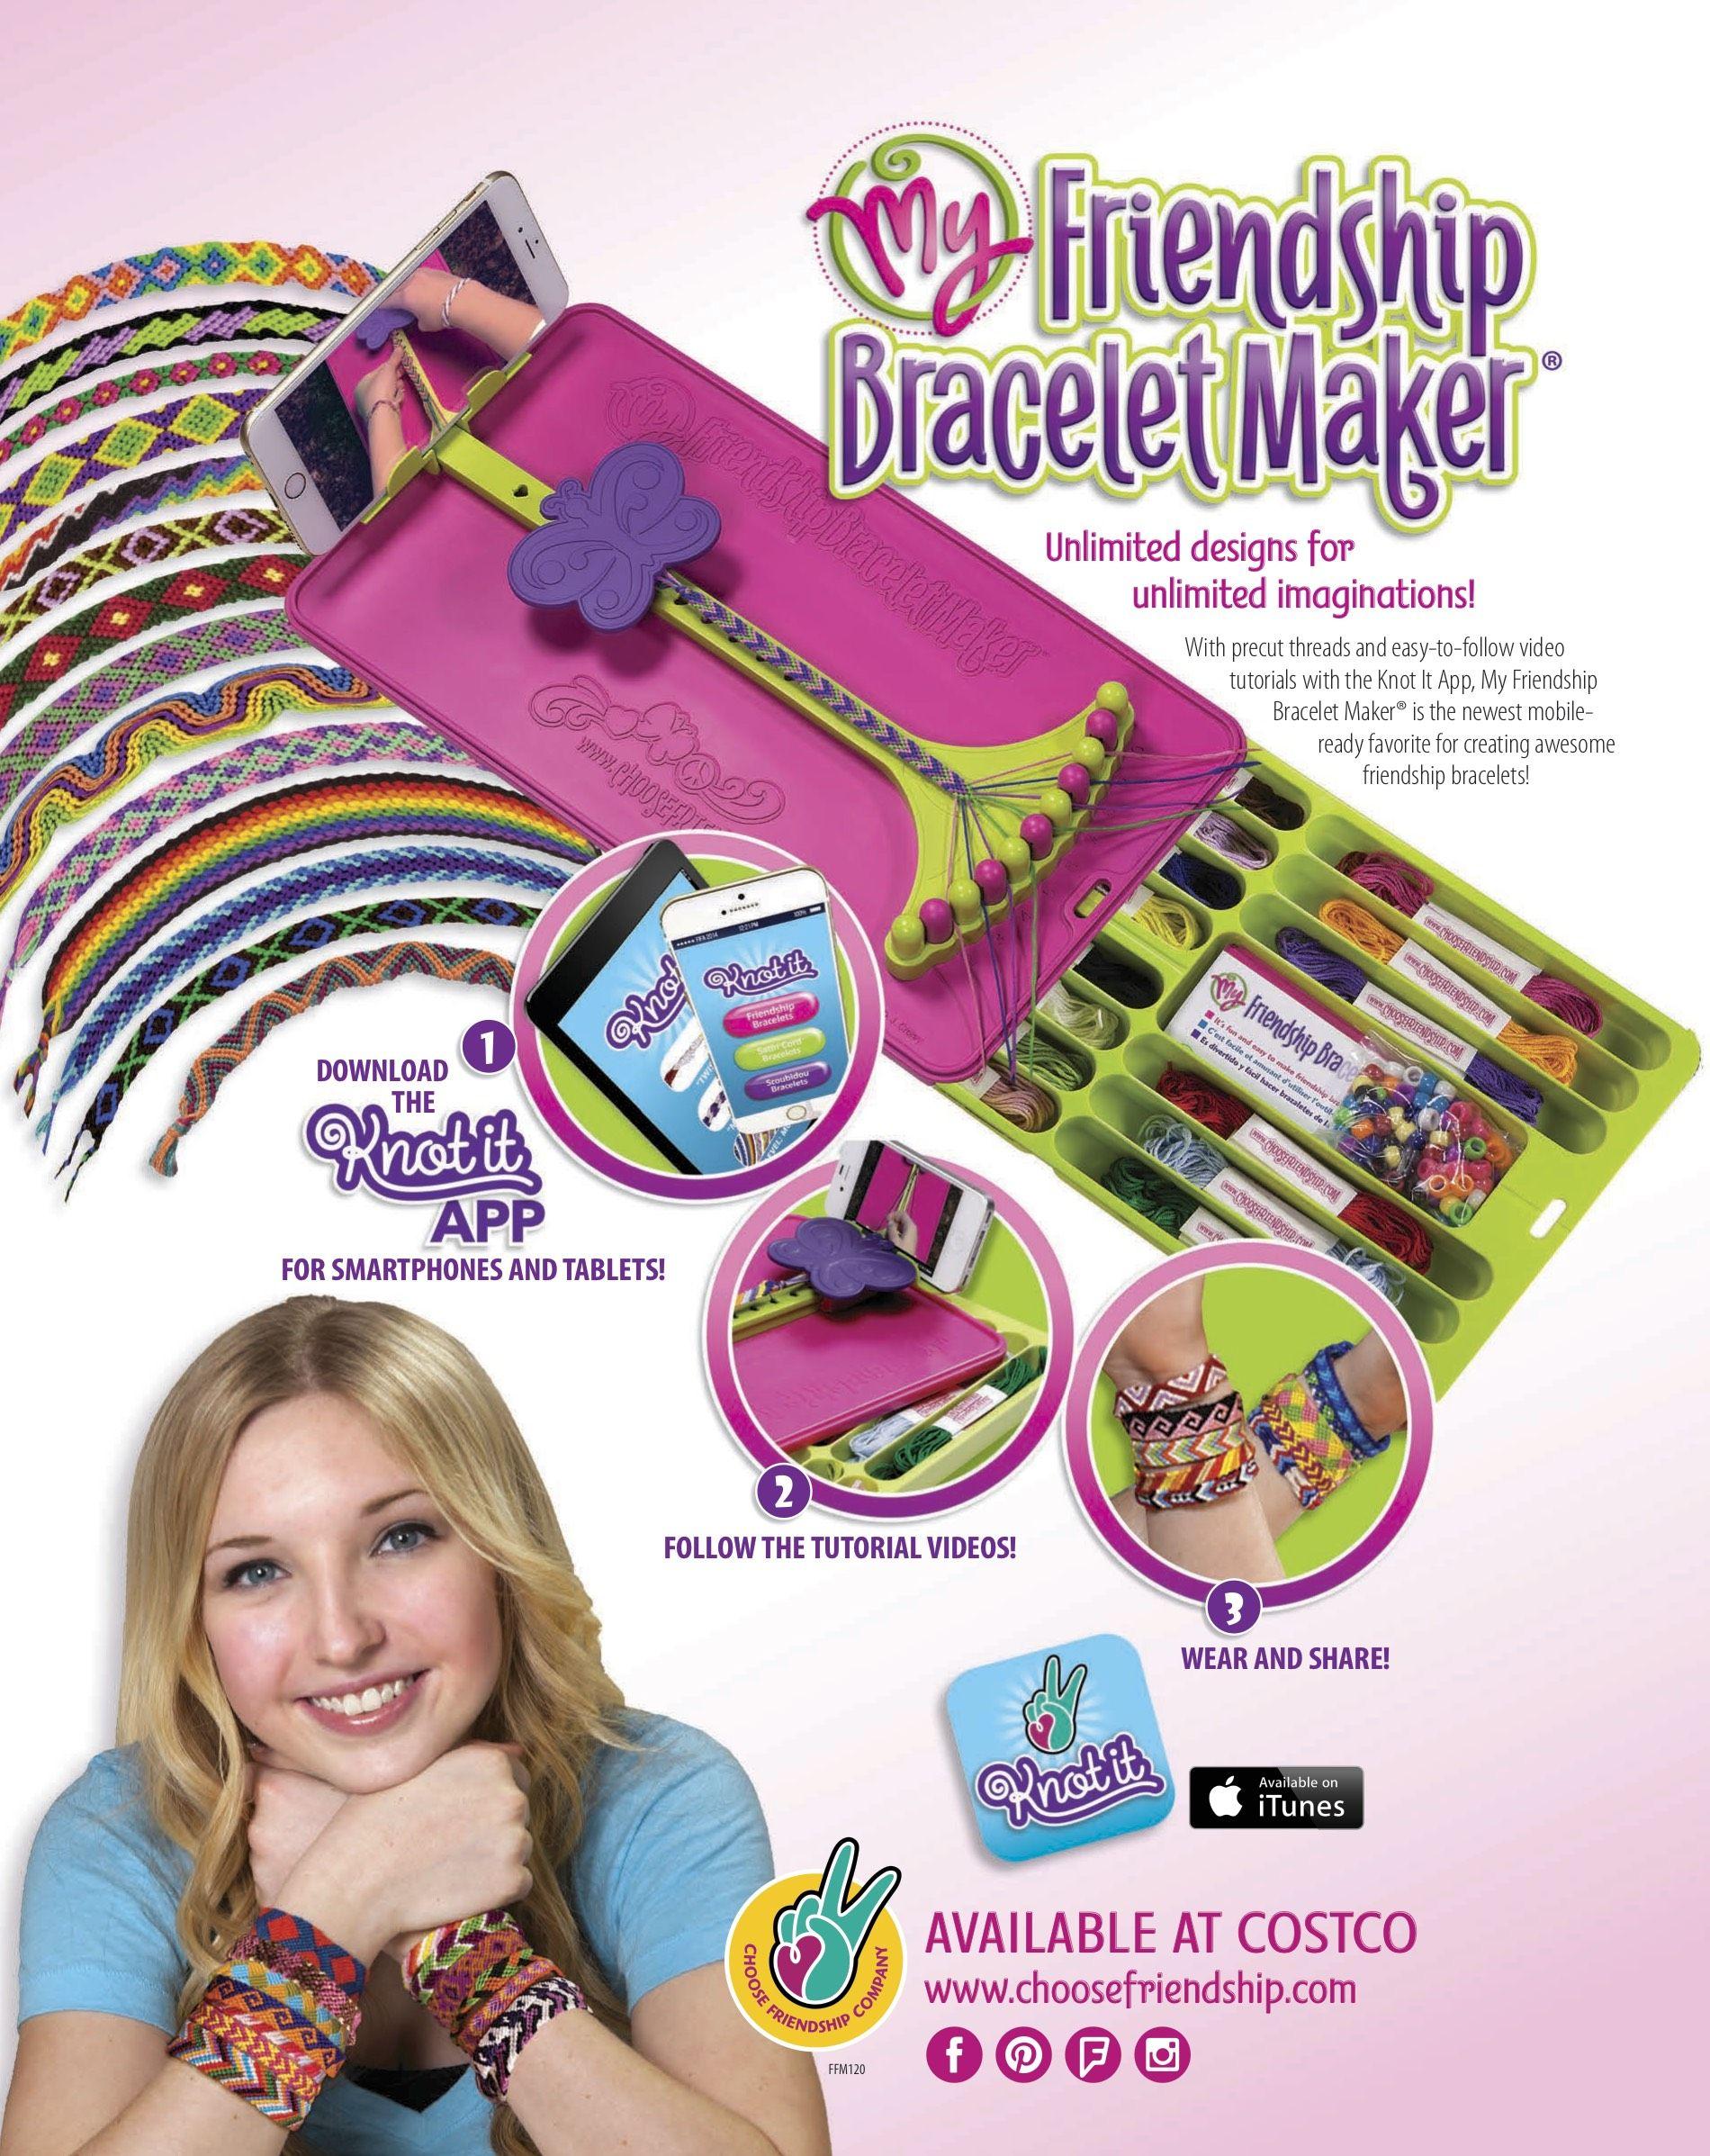 The Special Edition My Friendship Bracelet Maker Friendship